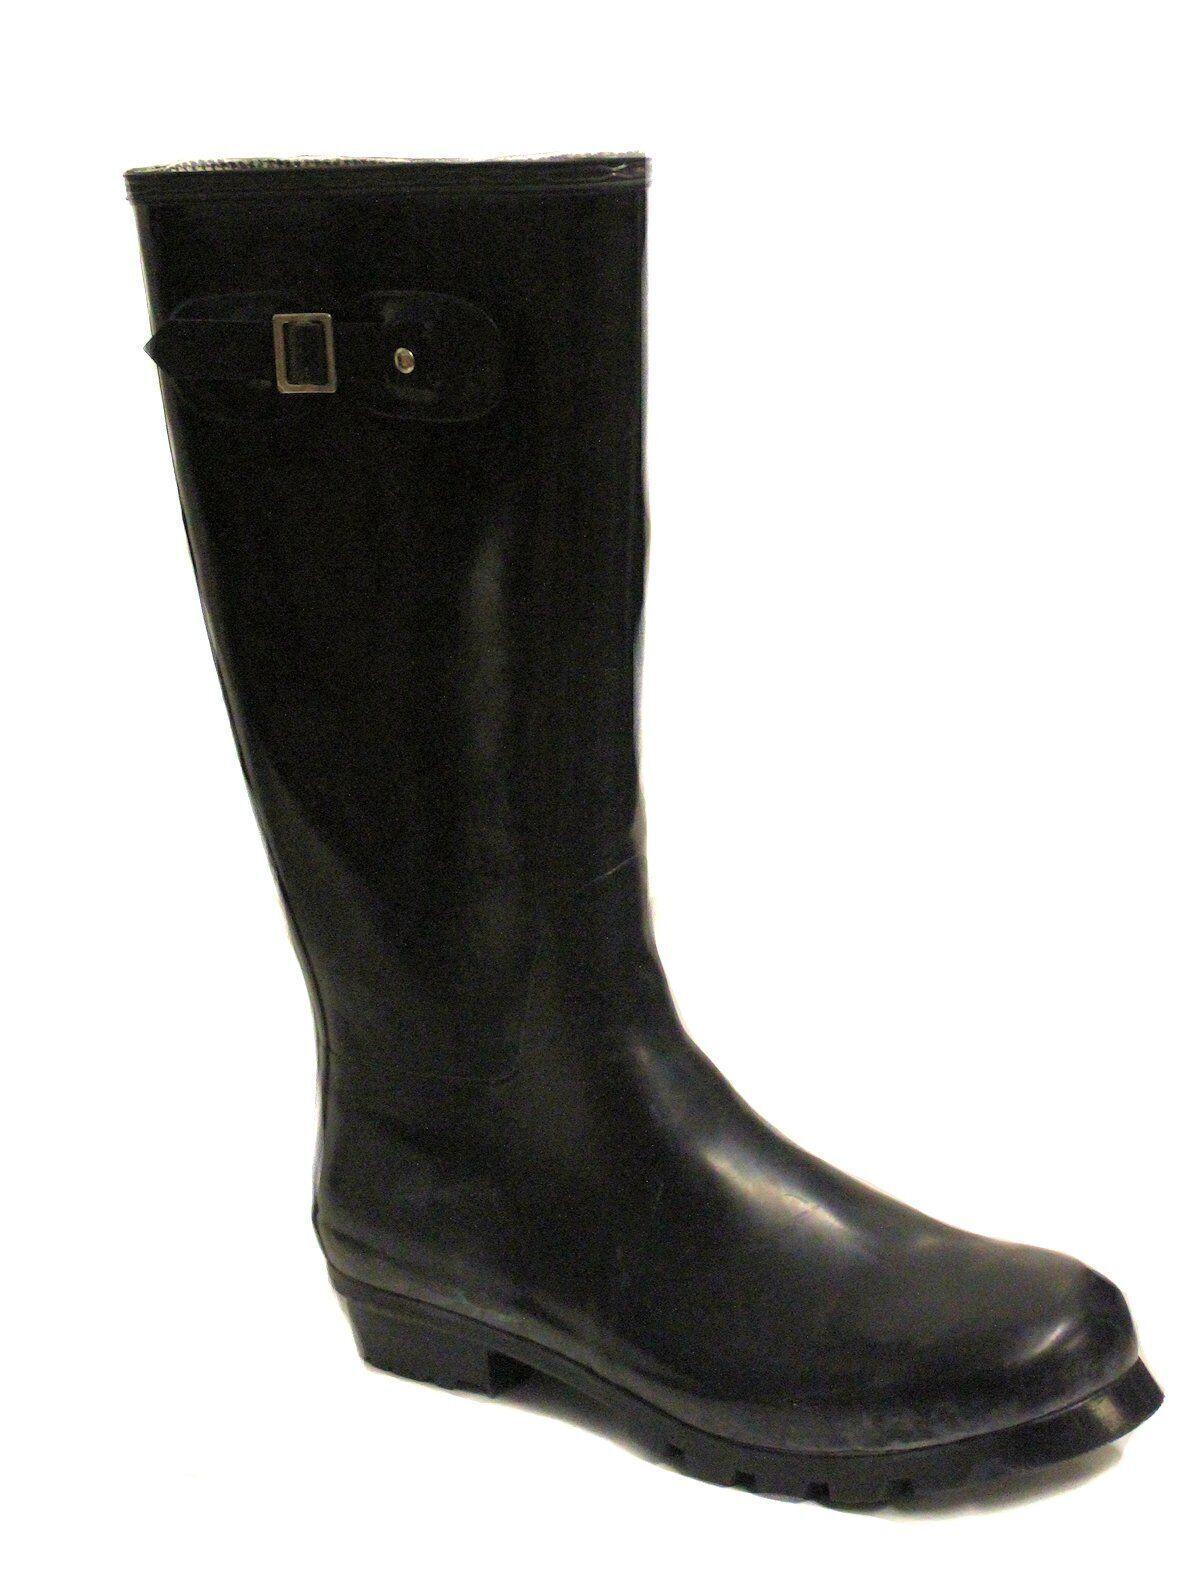 14TH & Union Women's Highland Rubber Boot Black US 11 NOB NWD Scuffs